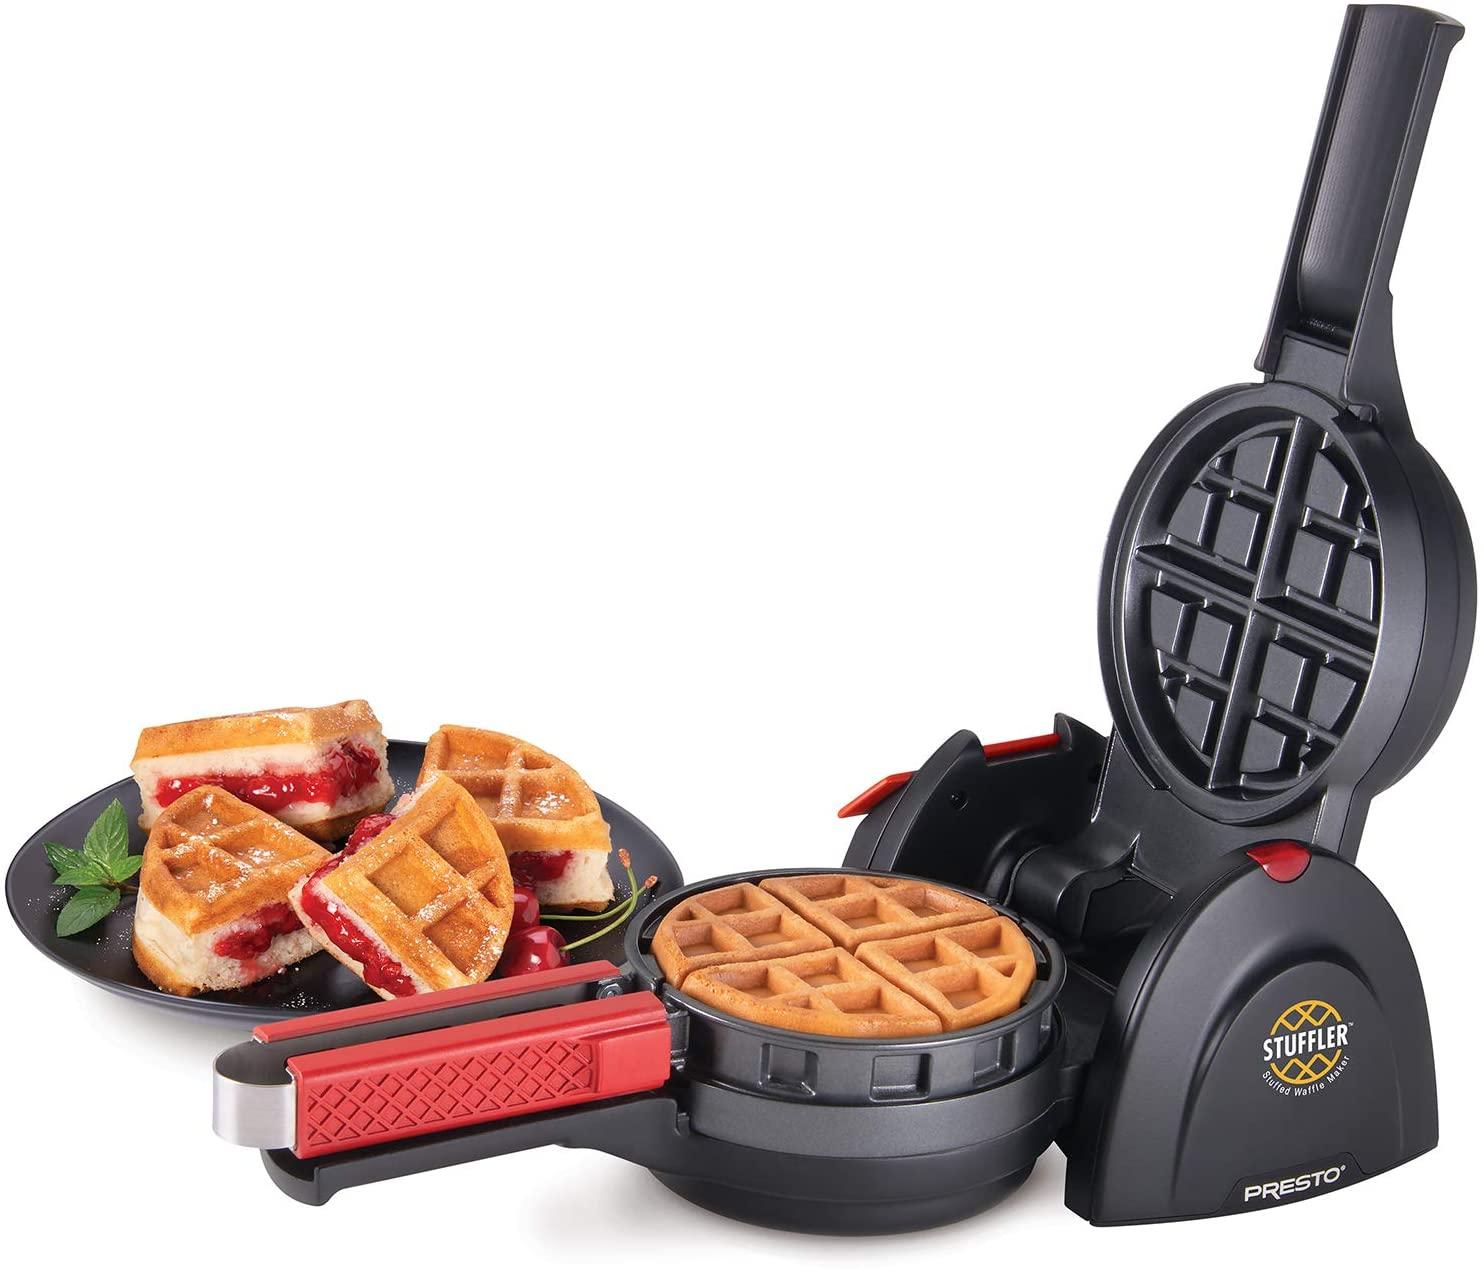 Presto 03512 Stuffler Stuffed Waffle Maker